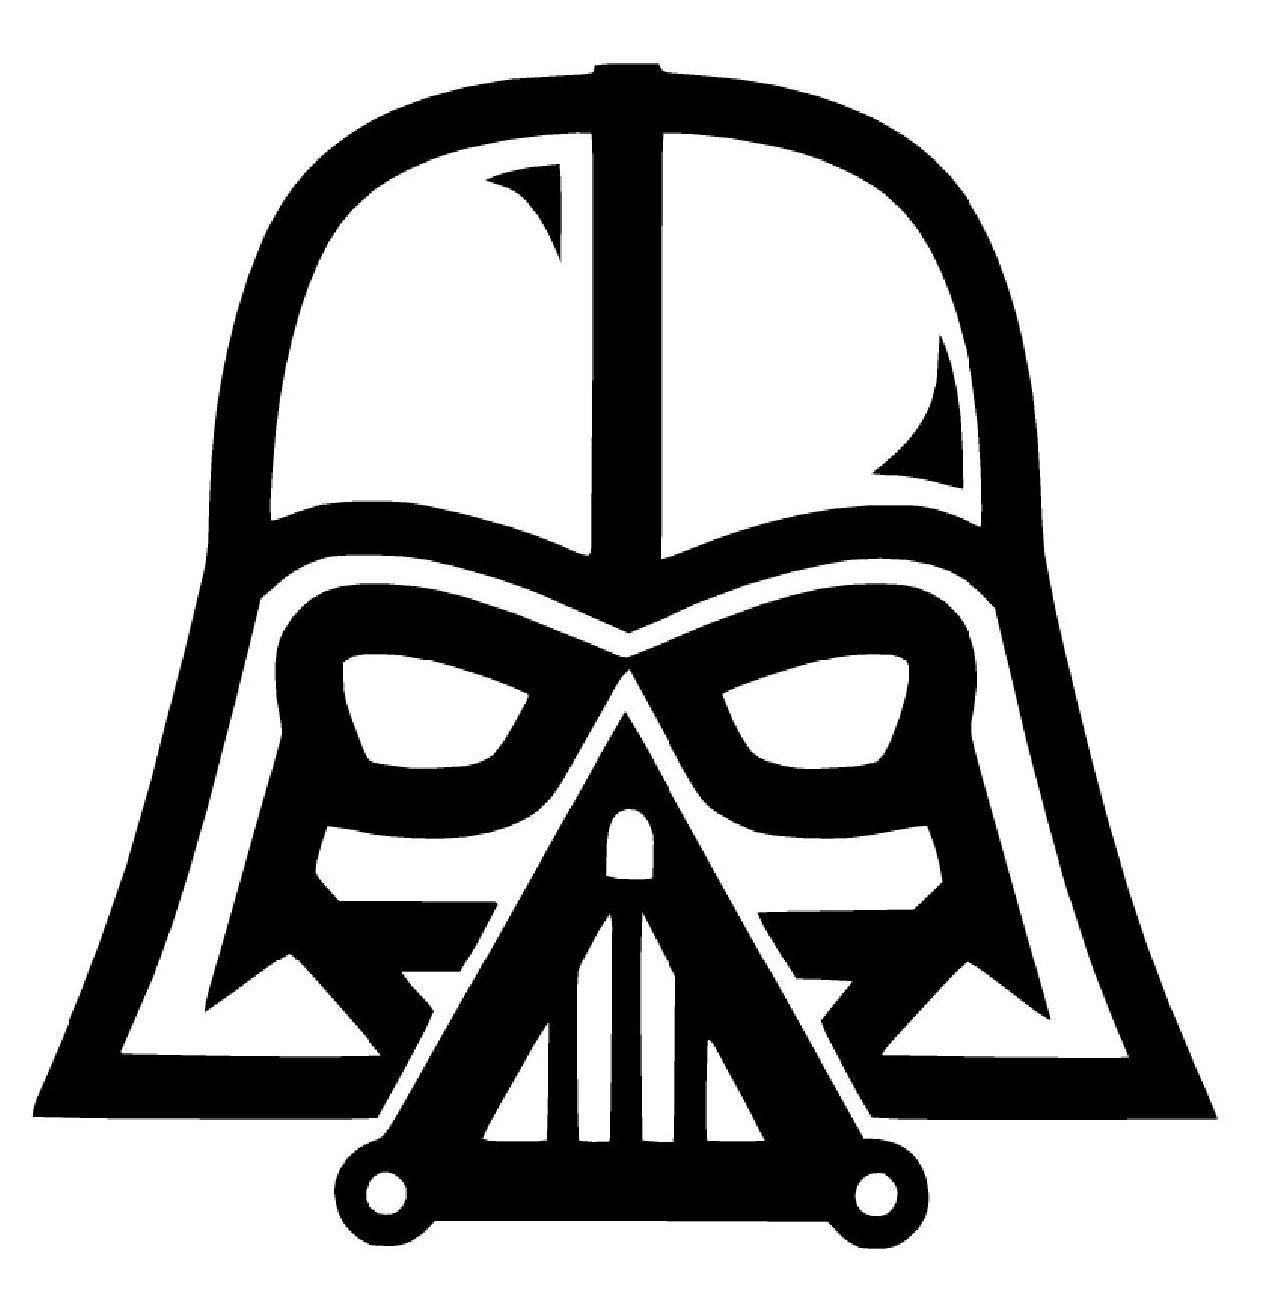 Darth Vader Star Wars The Force Awakens Vinyl Decal Sticker Car Rogue Window Star Wars Vinyl Decals Truck Bumpers [ jpg ]